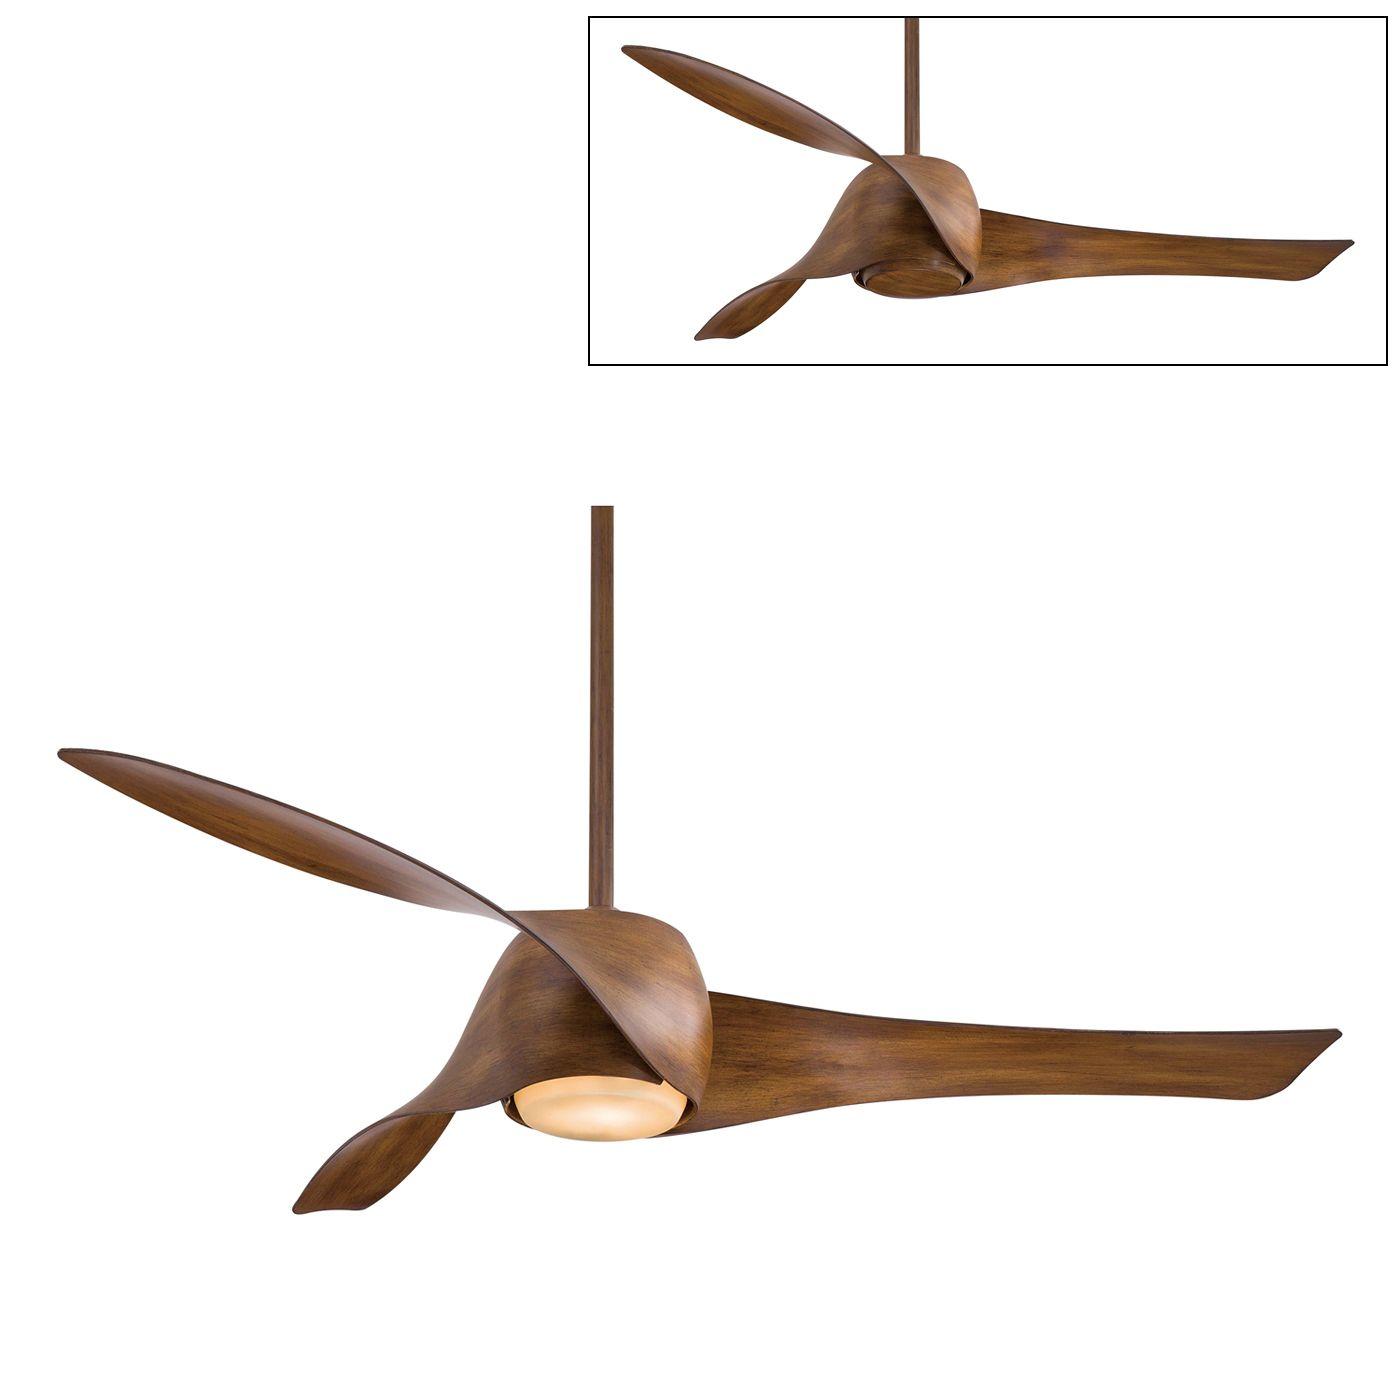 shop minka aire f803 58-in george kovacs® artemis™ ceiling fan at